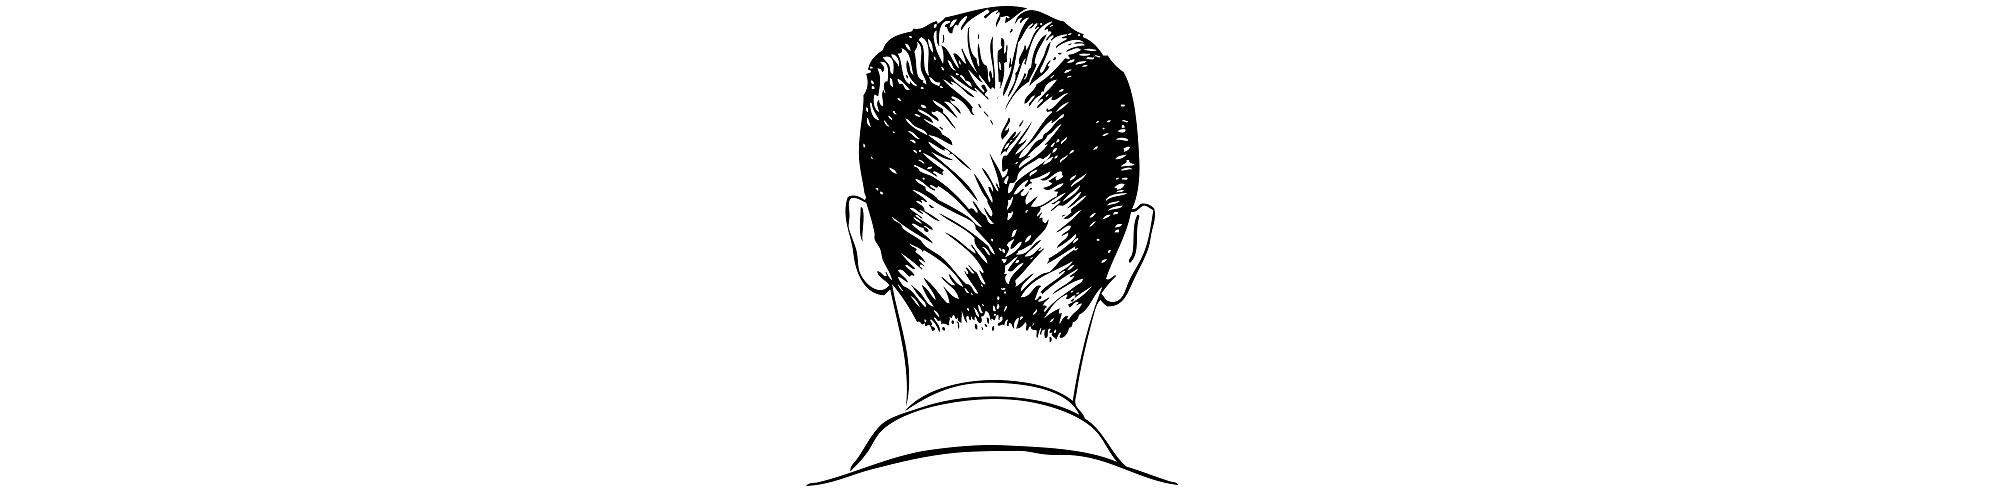 "Back of man's head illustration - ""Ego"" flash fiction"